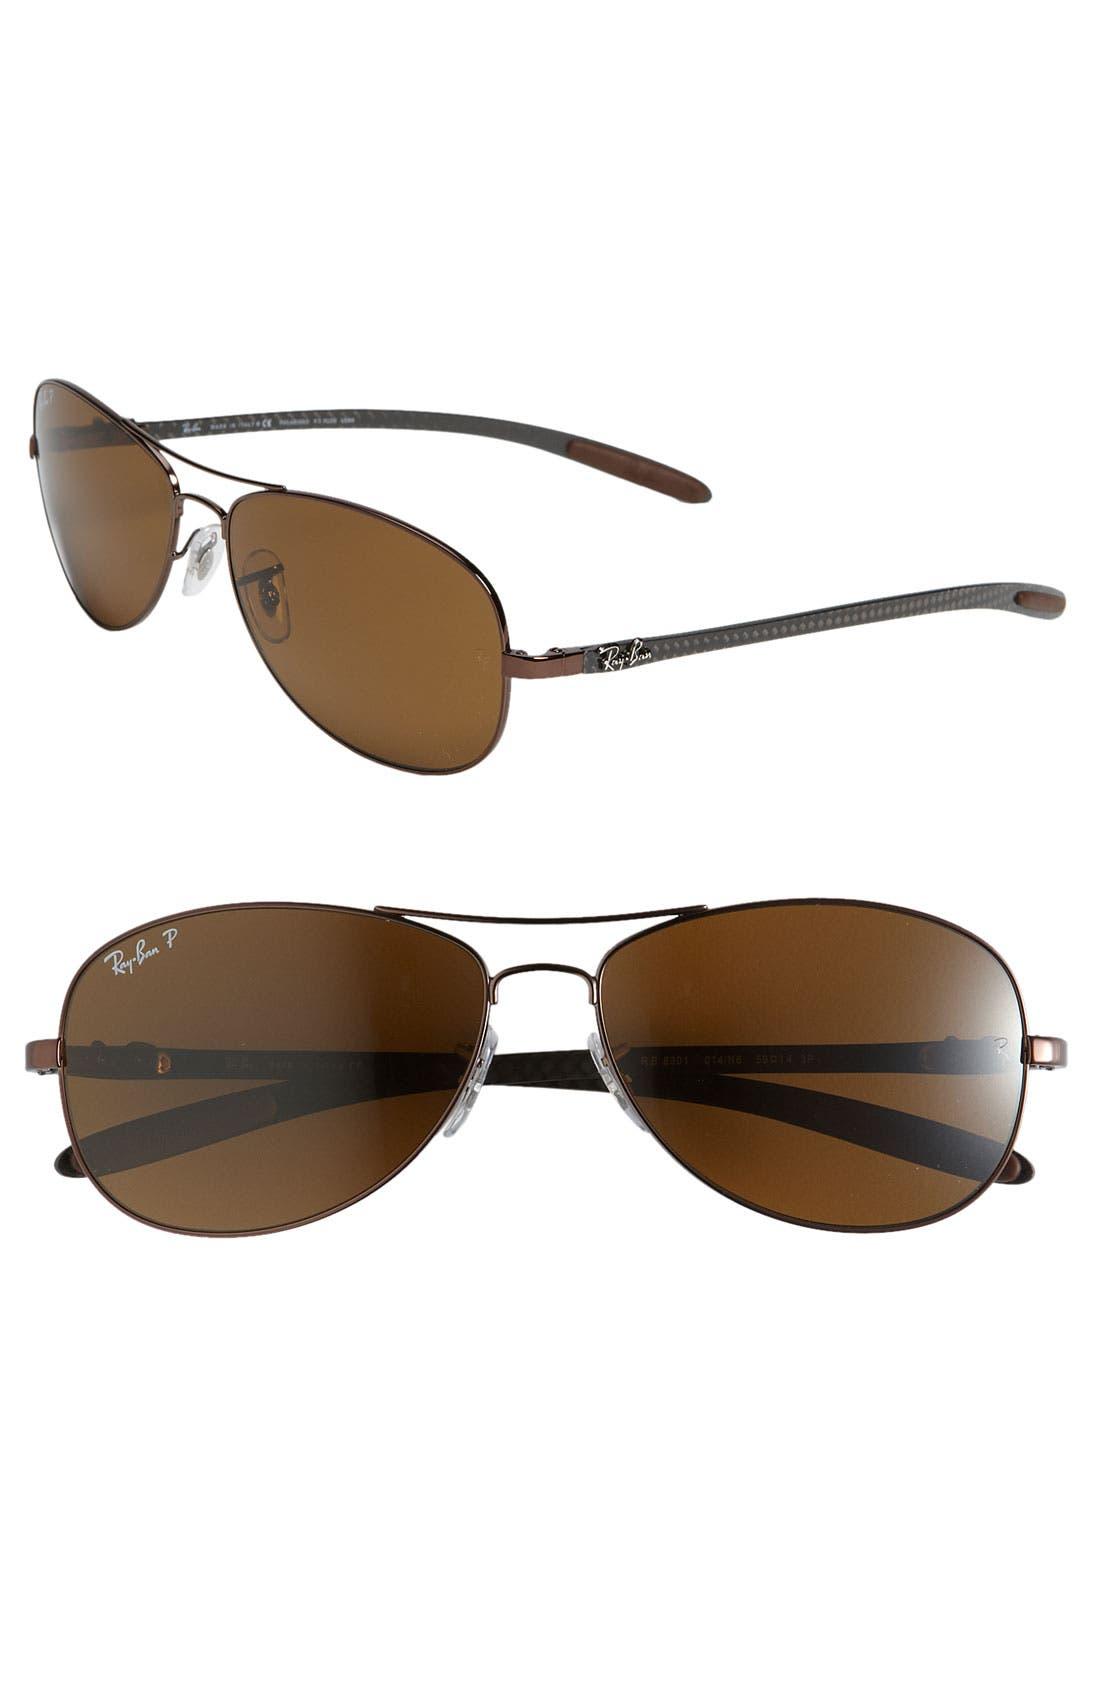 Main Image - Ray-Ban 'Tech' Polarized 59mm Aviator Sunglasses